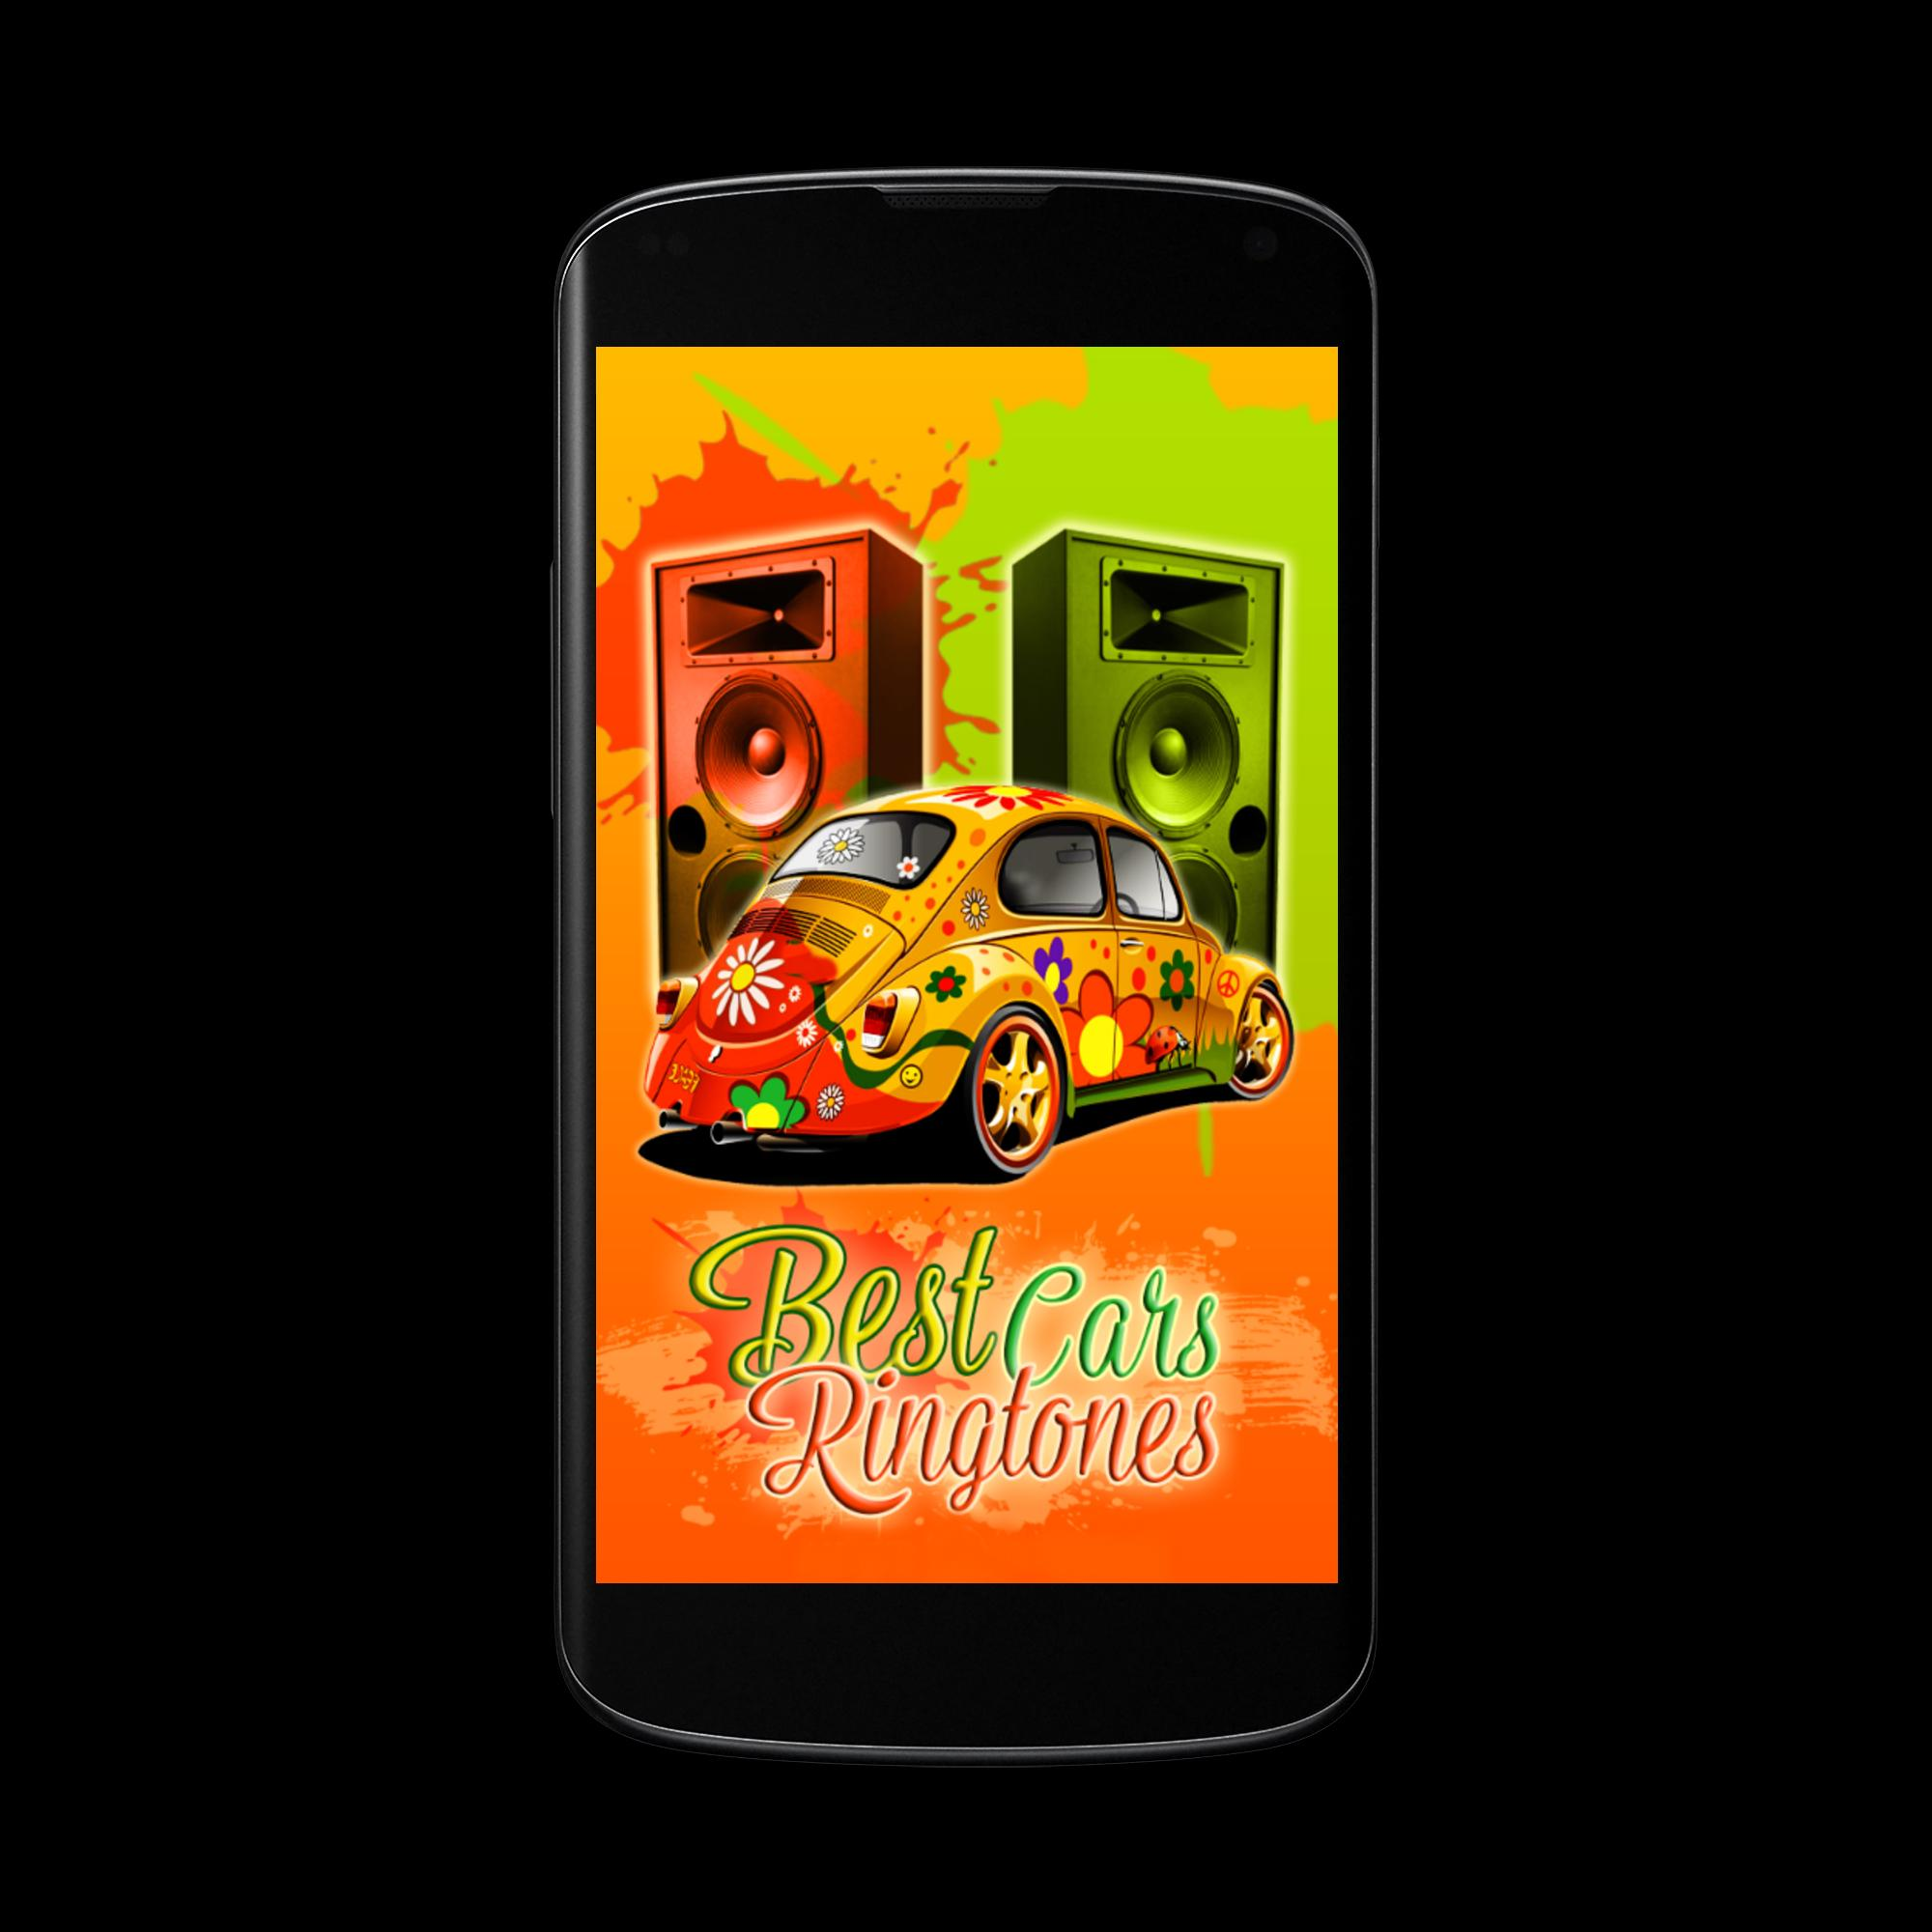 Car Engine Sounds Ringtones for Android - APK Download